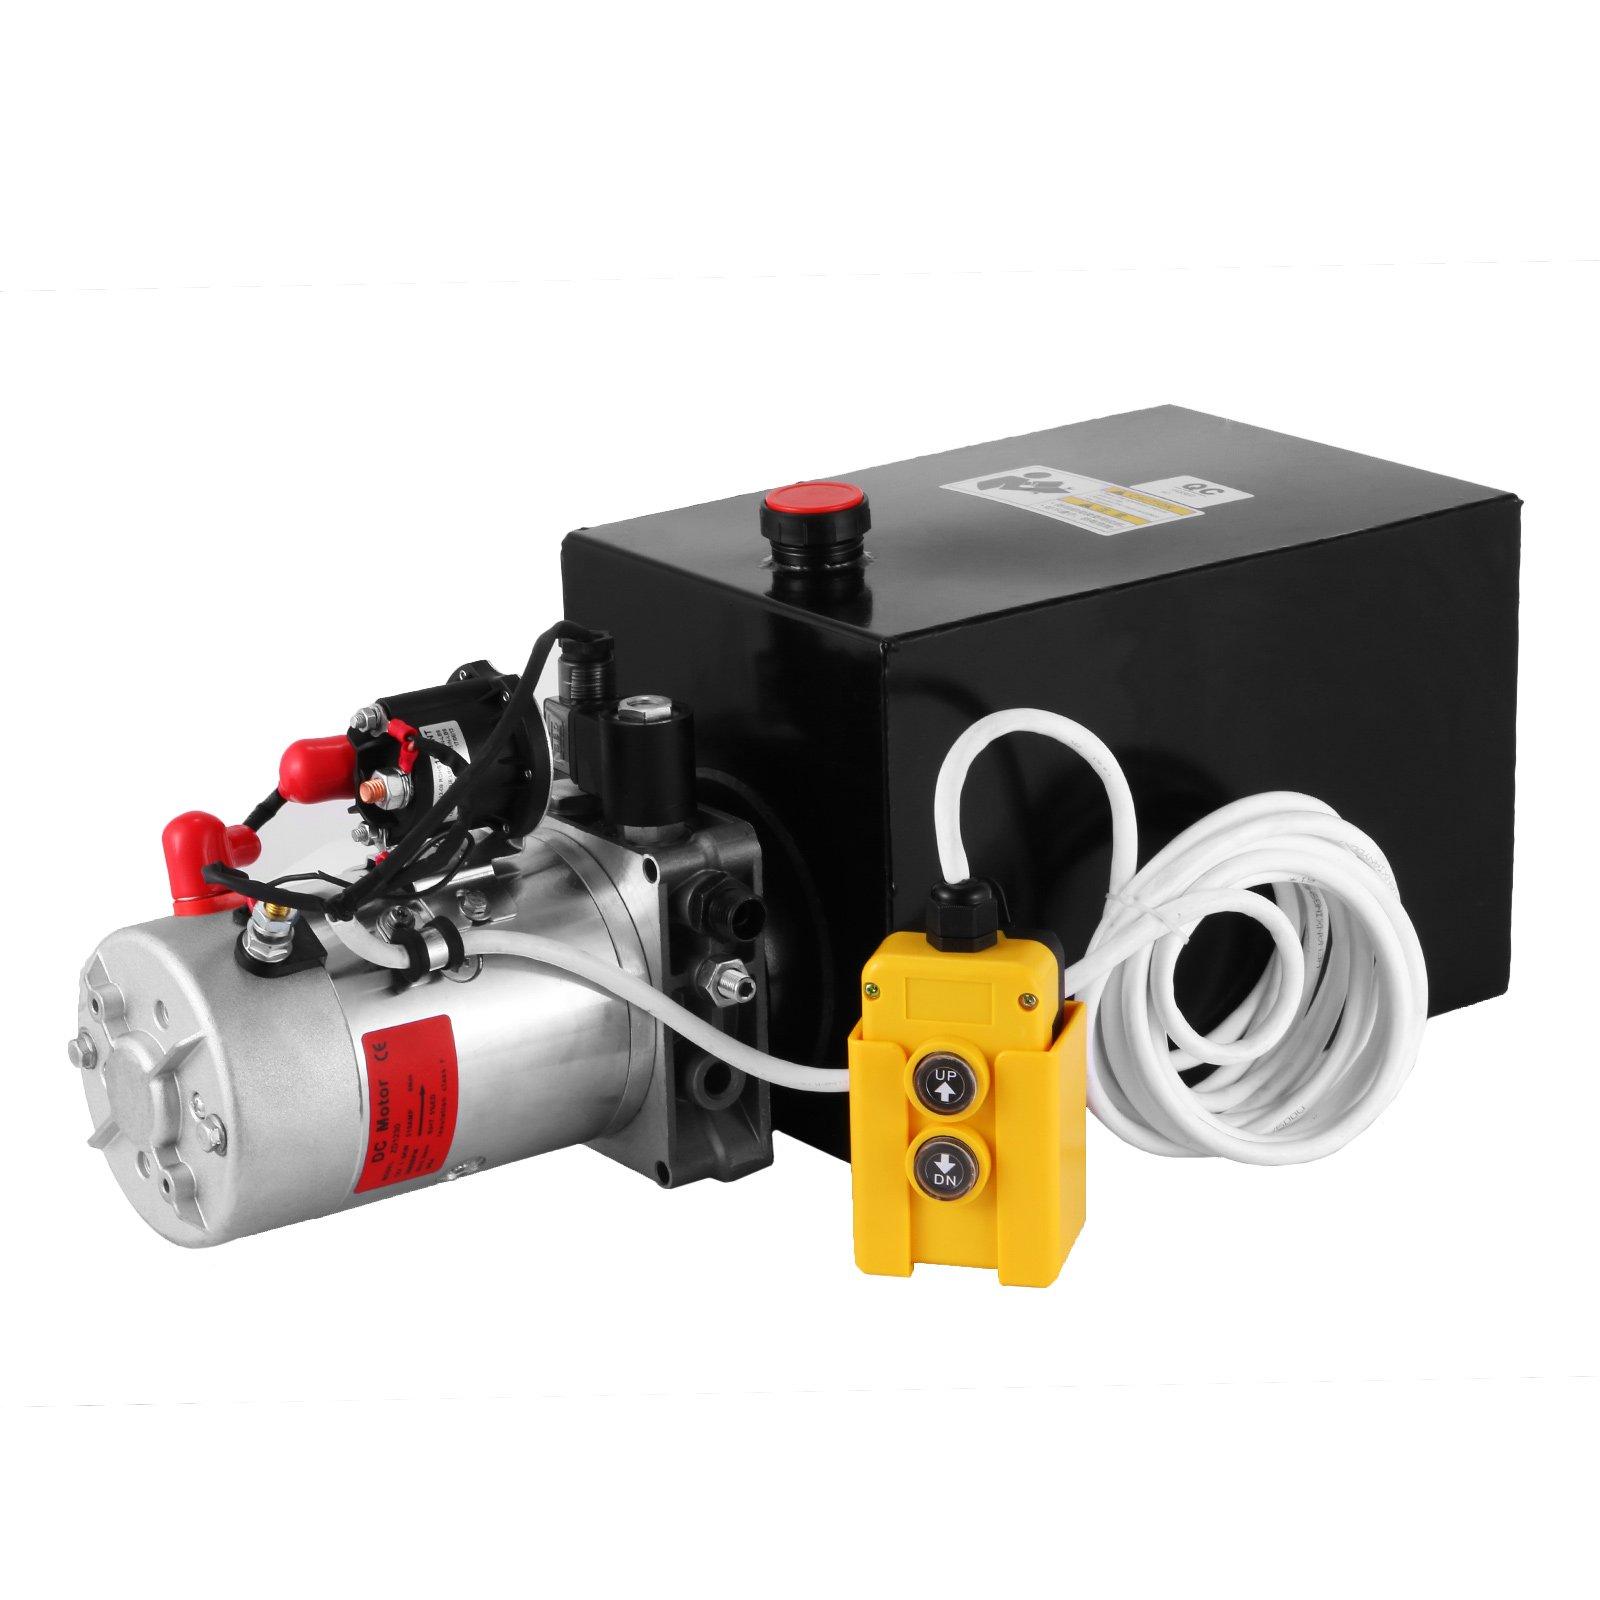 Mophorn 12 Quart Single Acting Hydraulic Pump 12V Hydraulic Power Unit with Steel Reservoir for Dump Trailer Truck Car Lift Unit